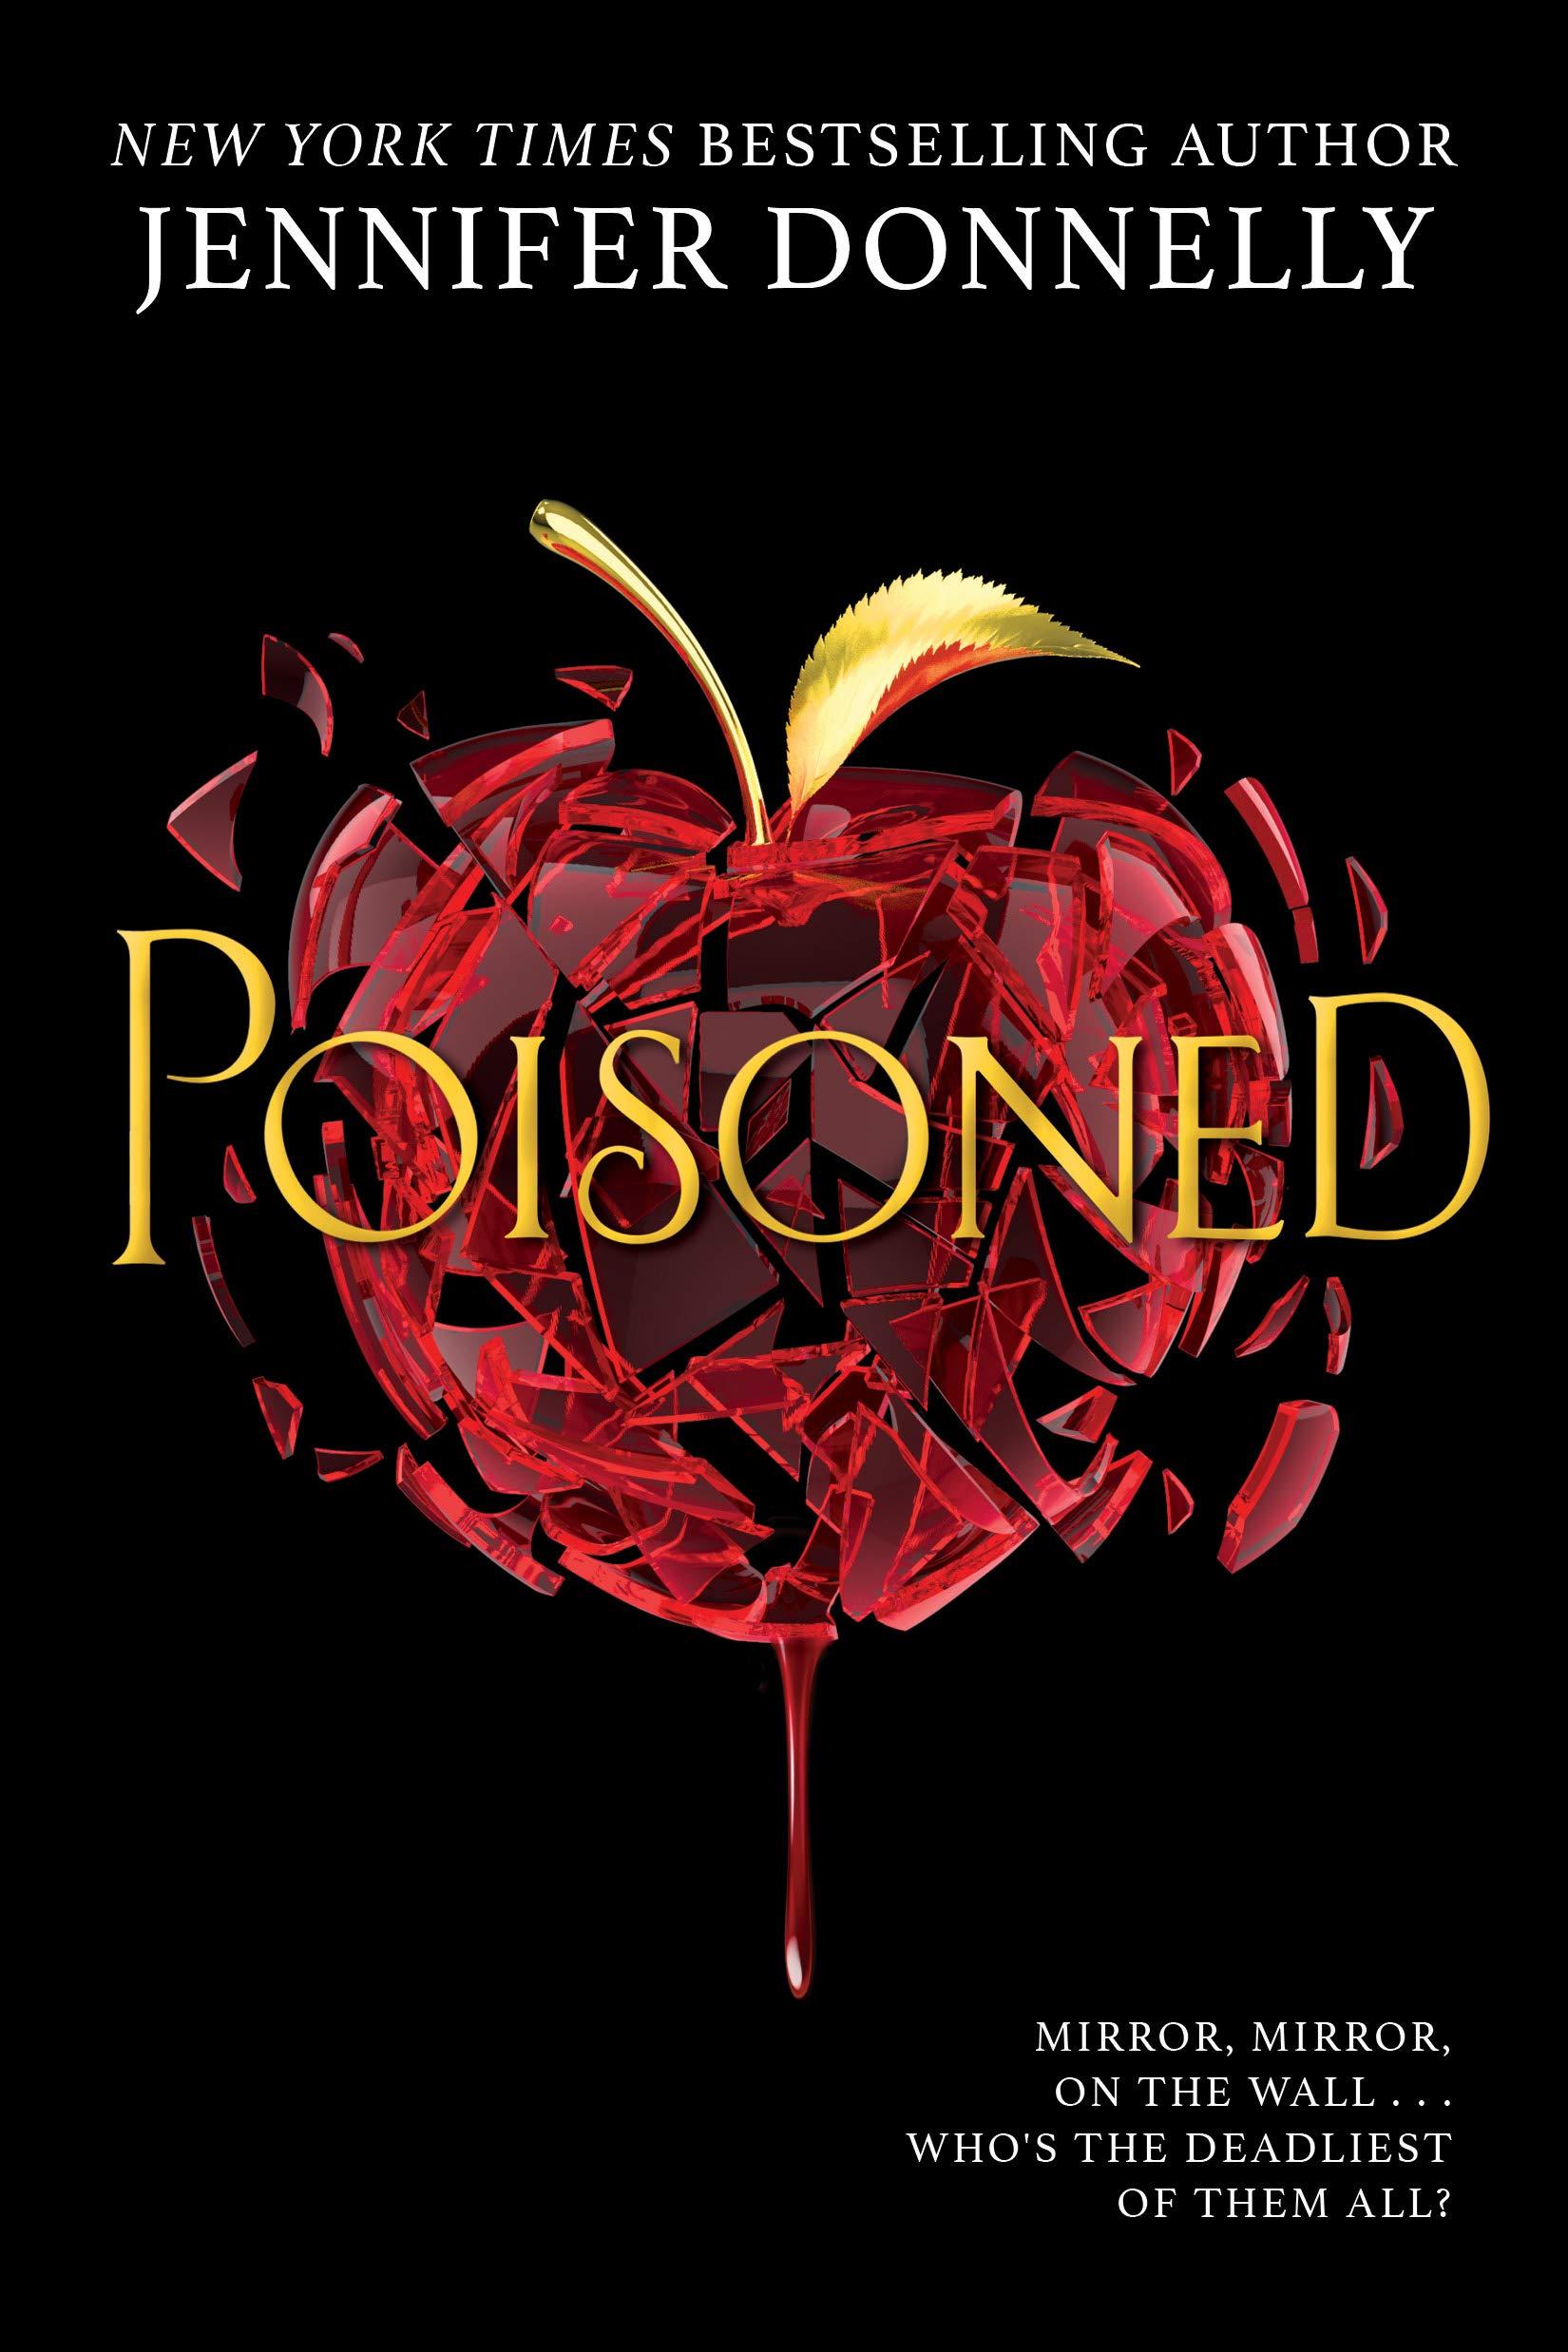 Amazon.com: Poisoned (9781338268492): Donnelly, Jennifer: Books